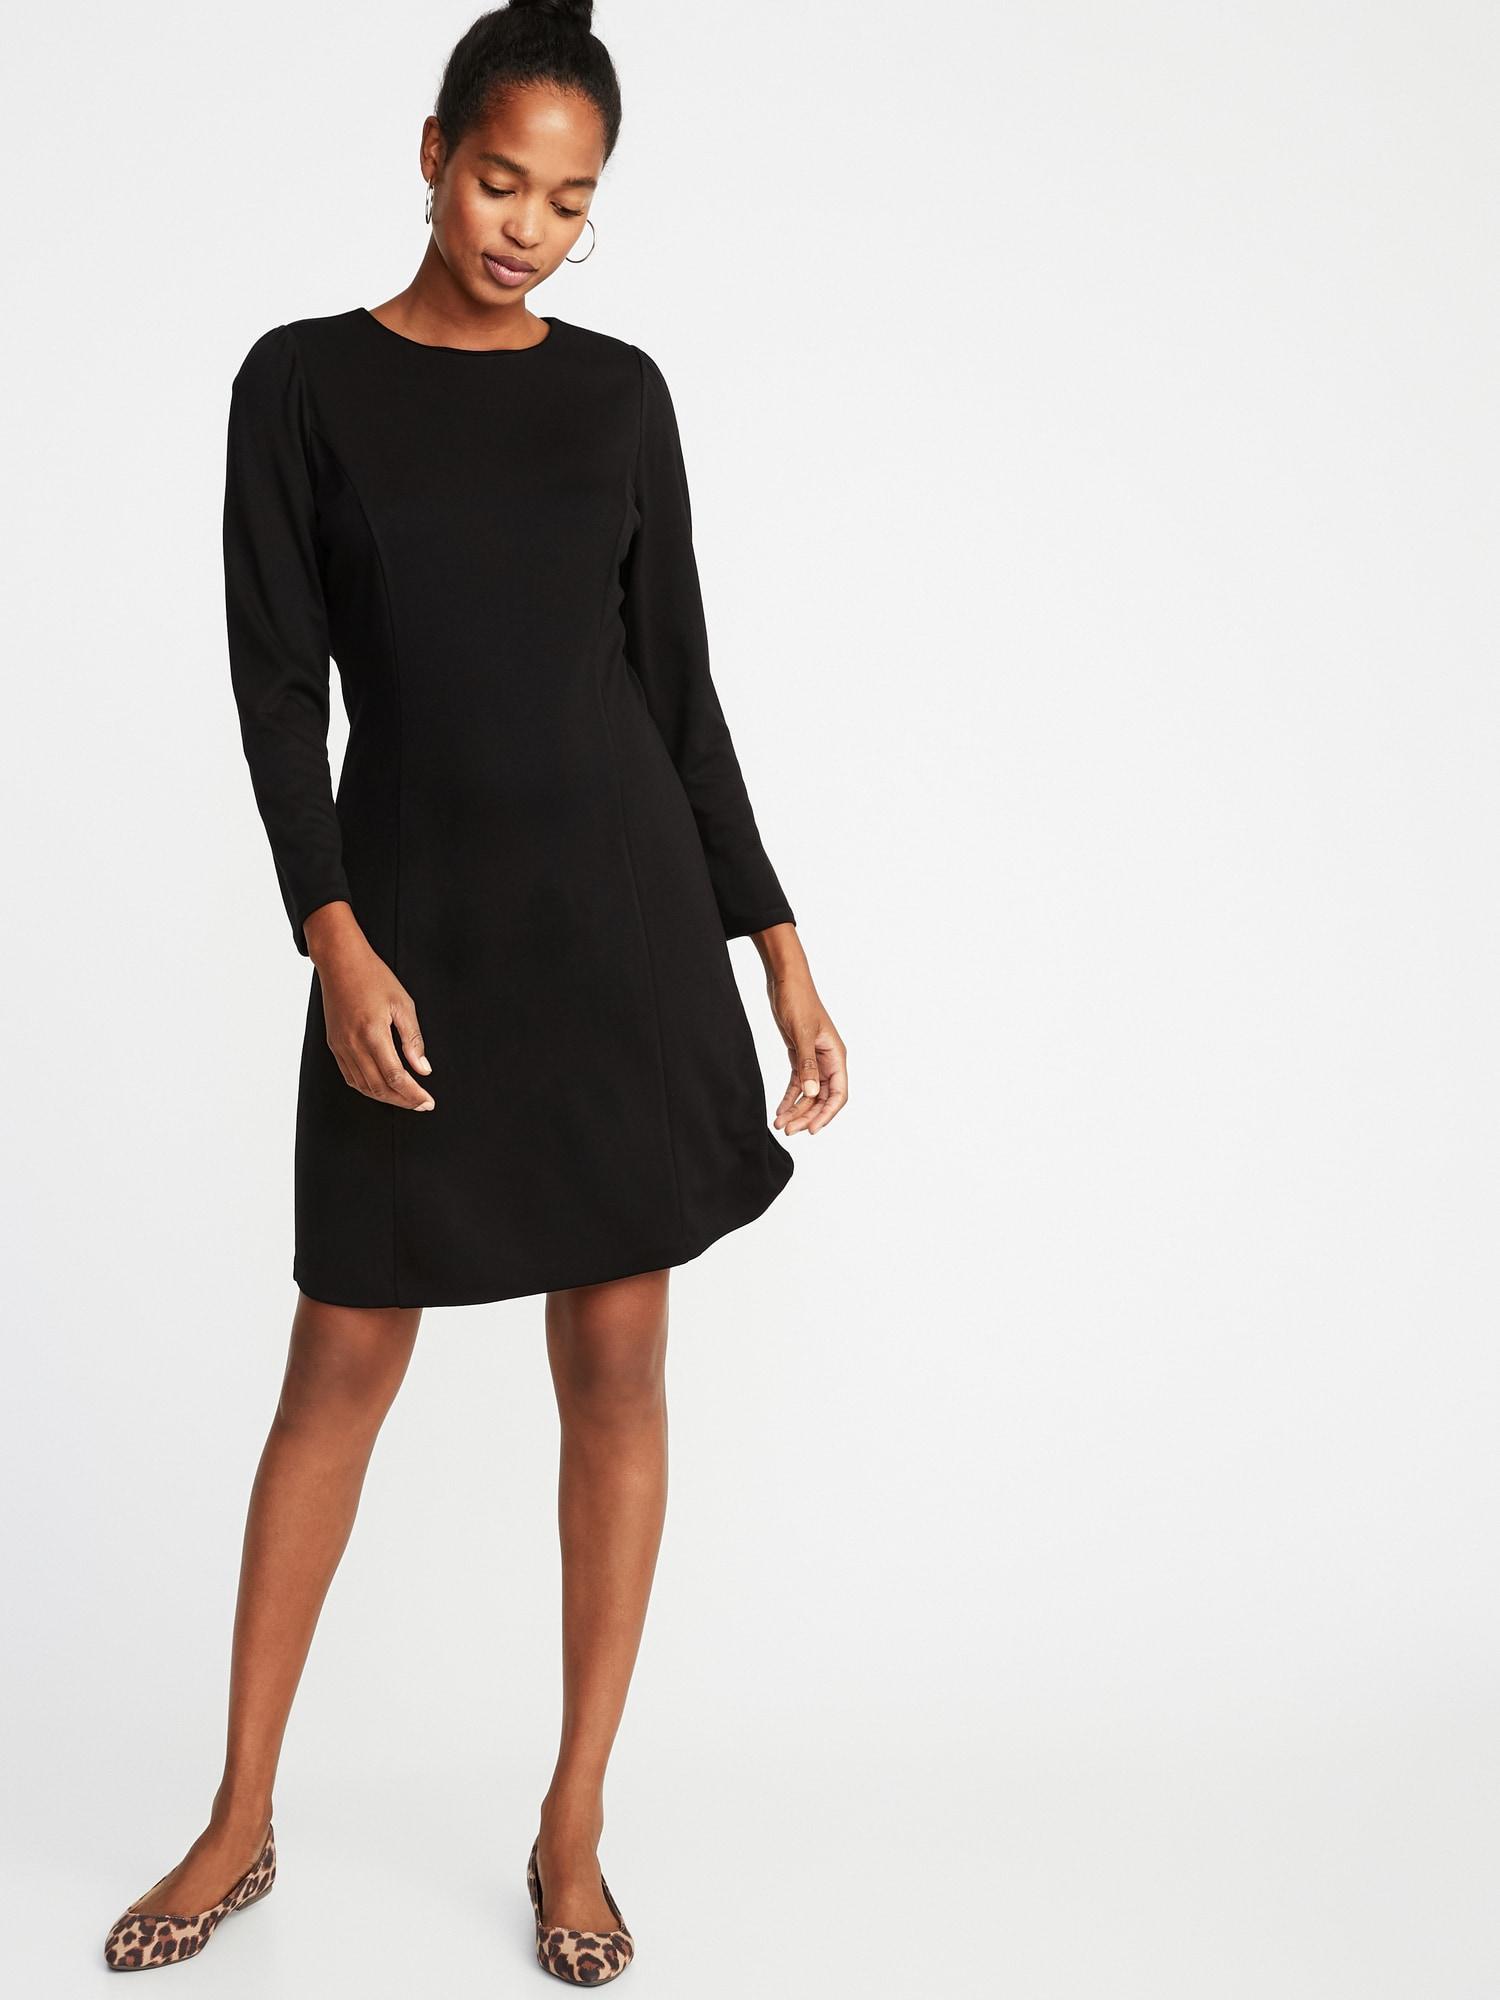 9ec249d0866 Lyst - Old Navy Ponte-knit Shirred-sleeve Sheath Dress in Black